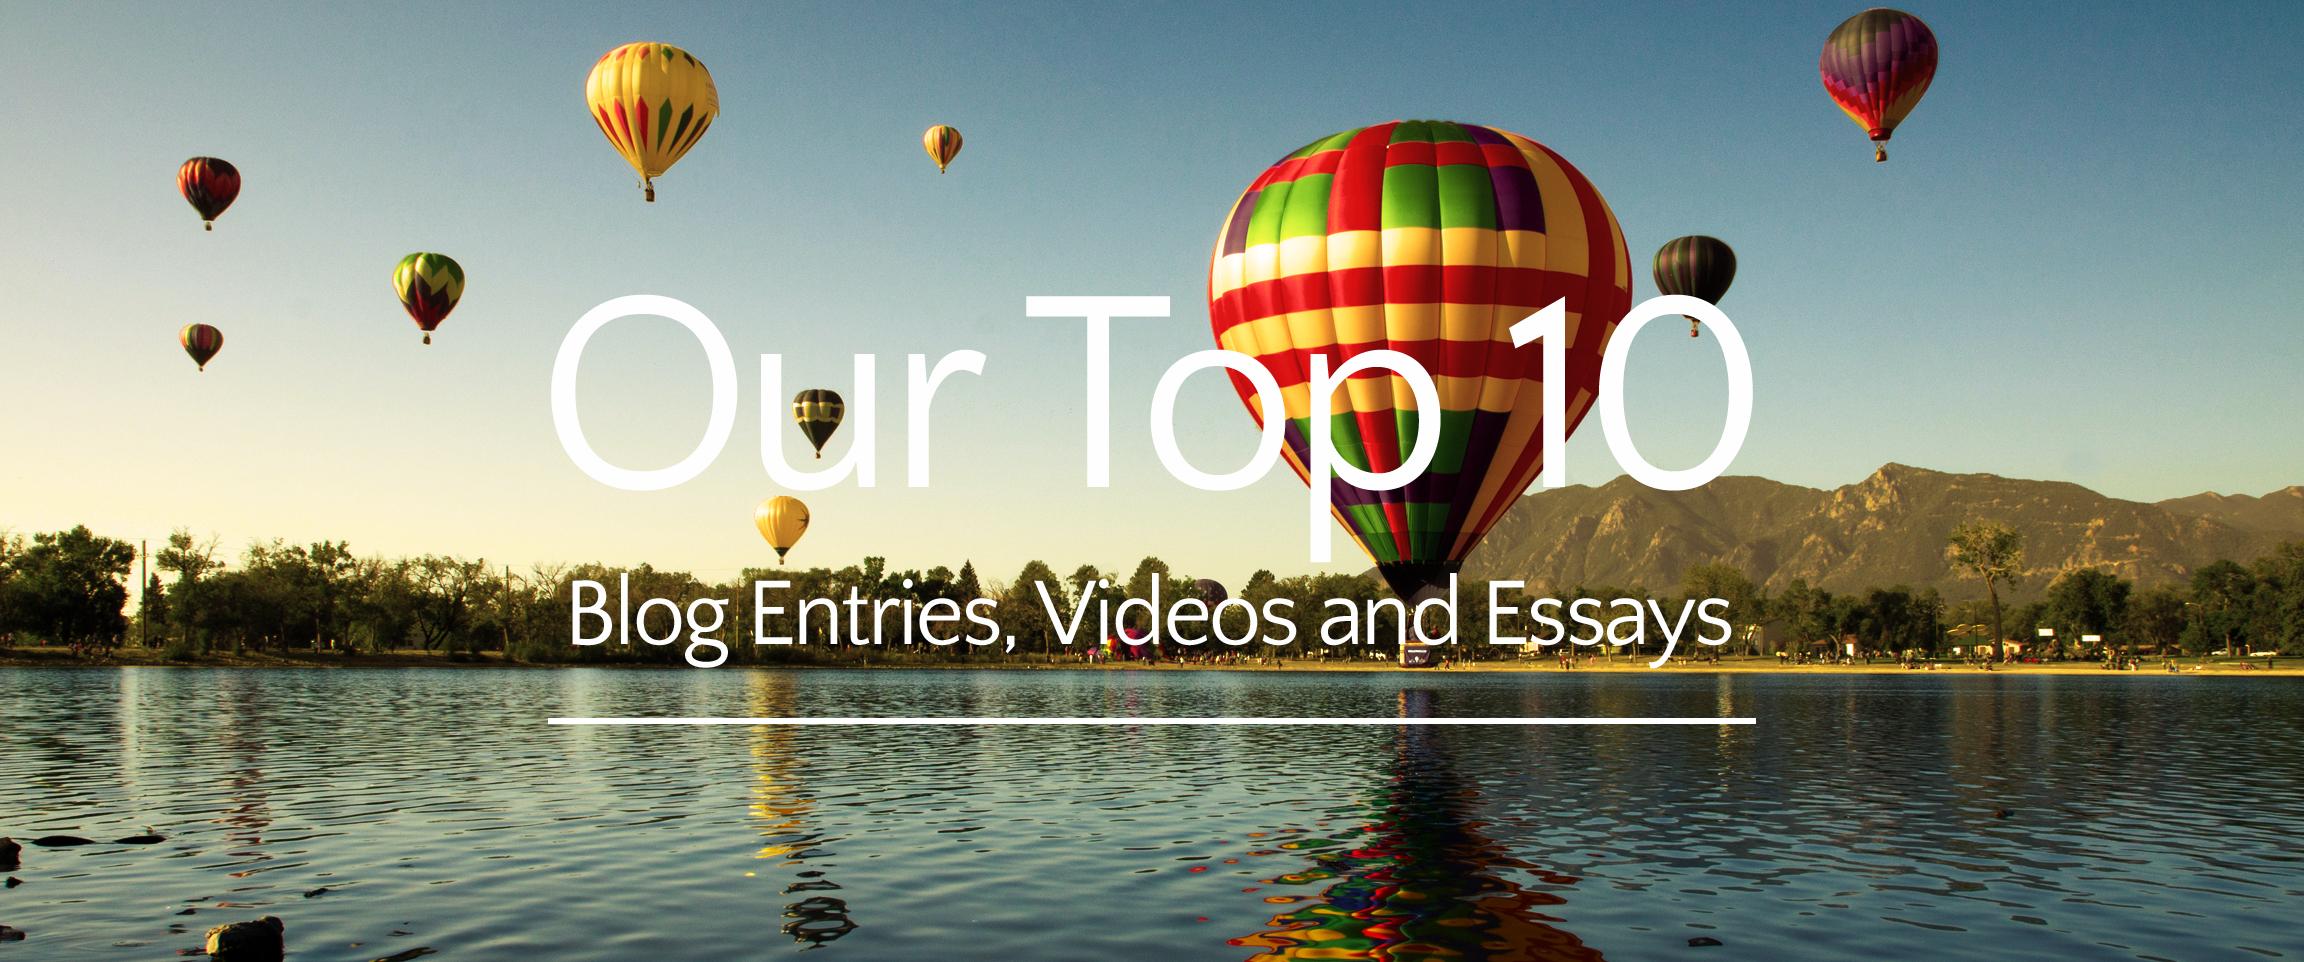 Top10.c.jpg